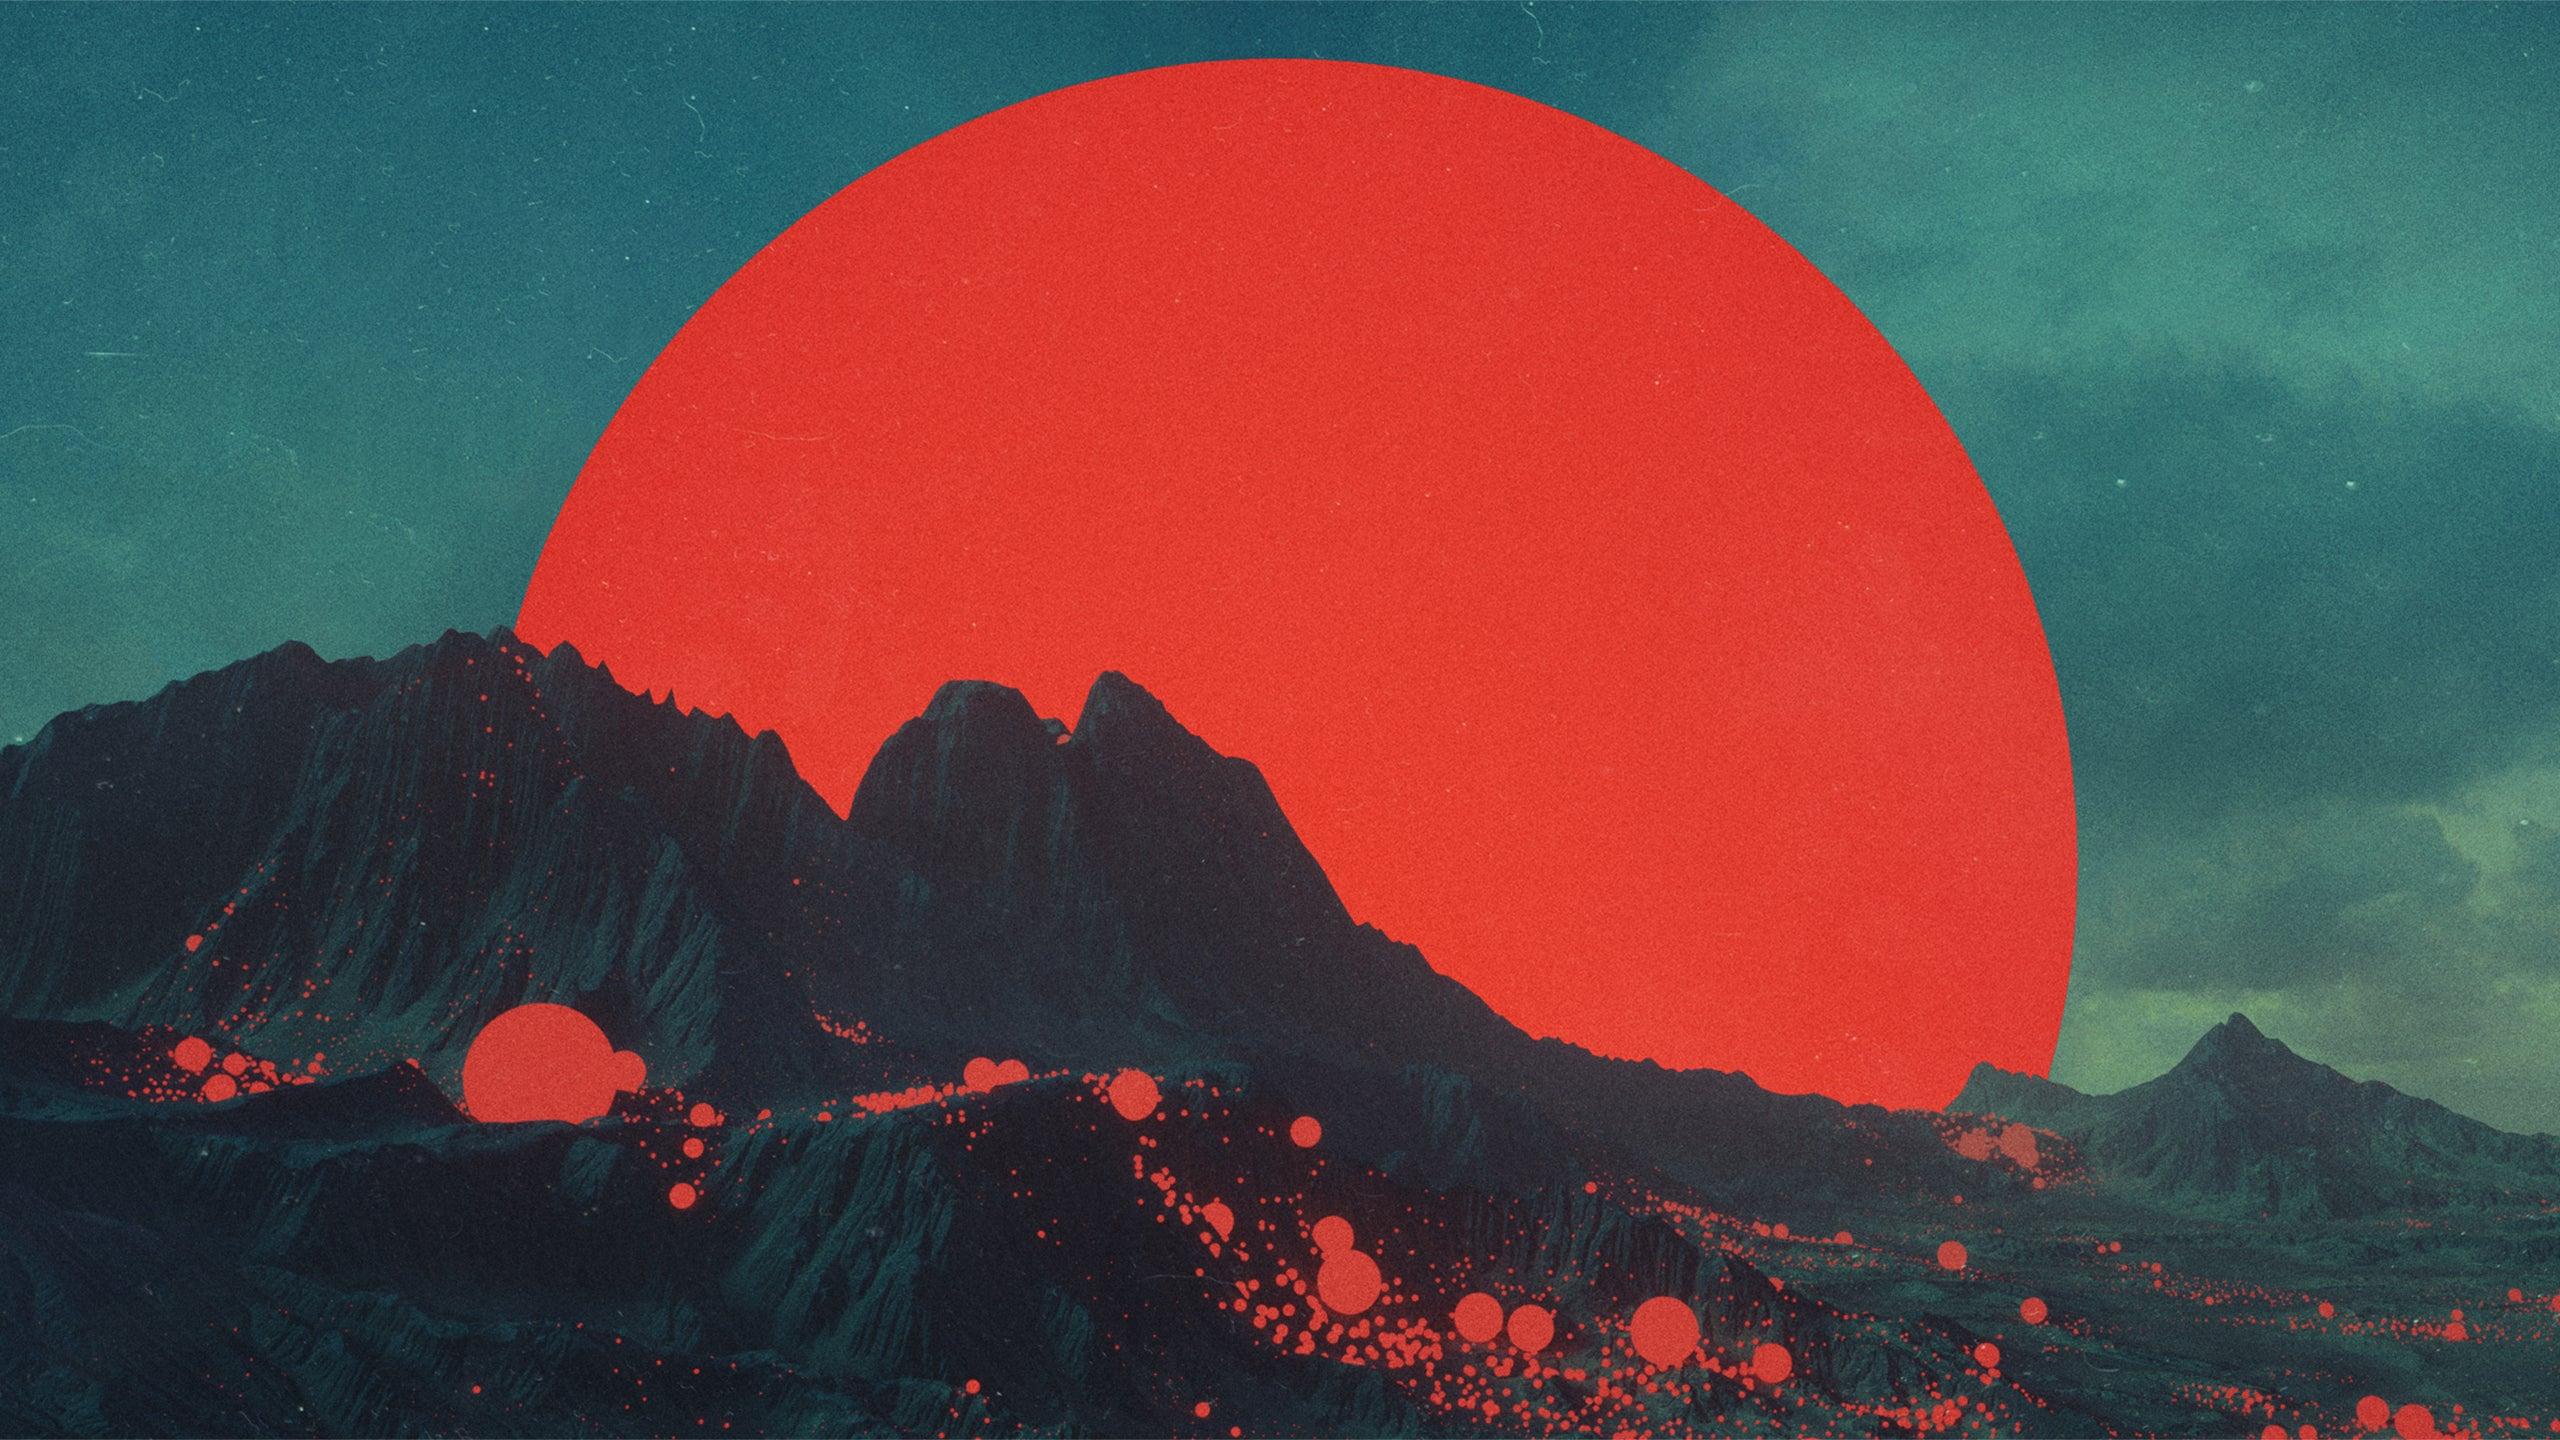 Red Moon HD wallpaper